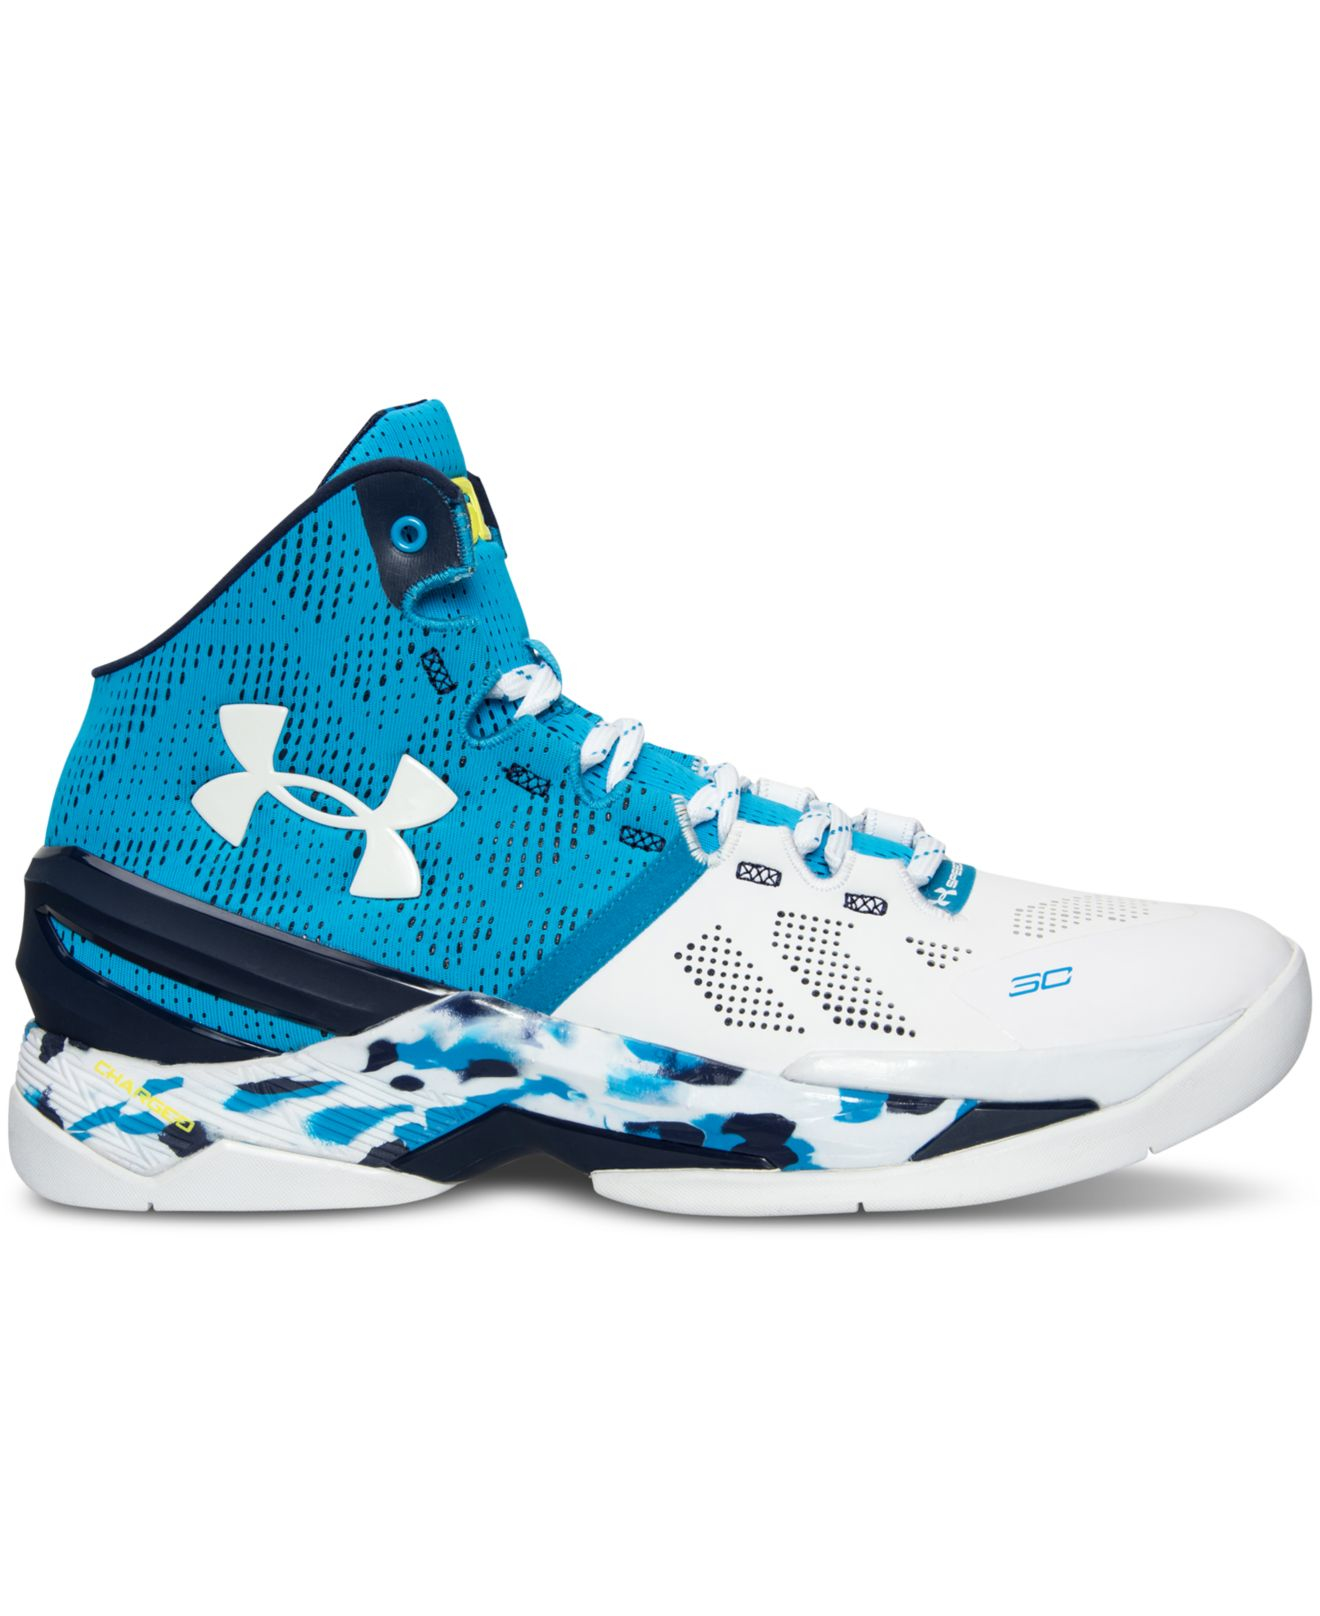 Finish Line Womens Basketball Shoes